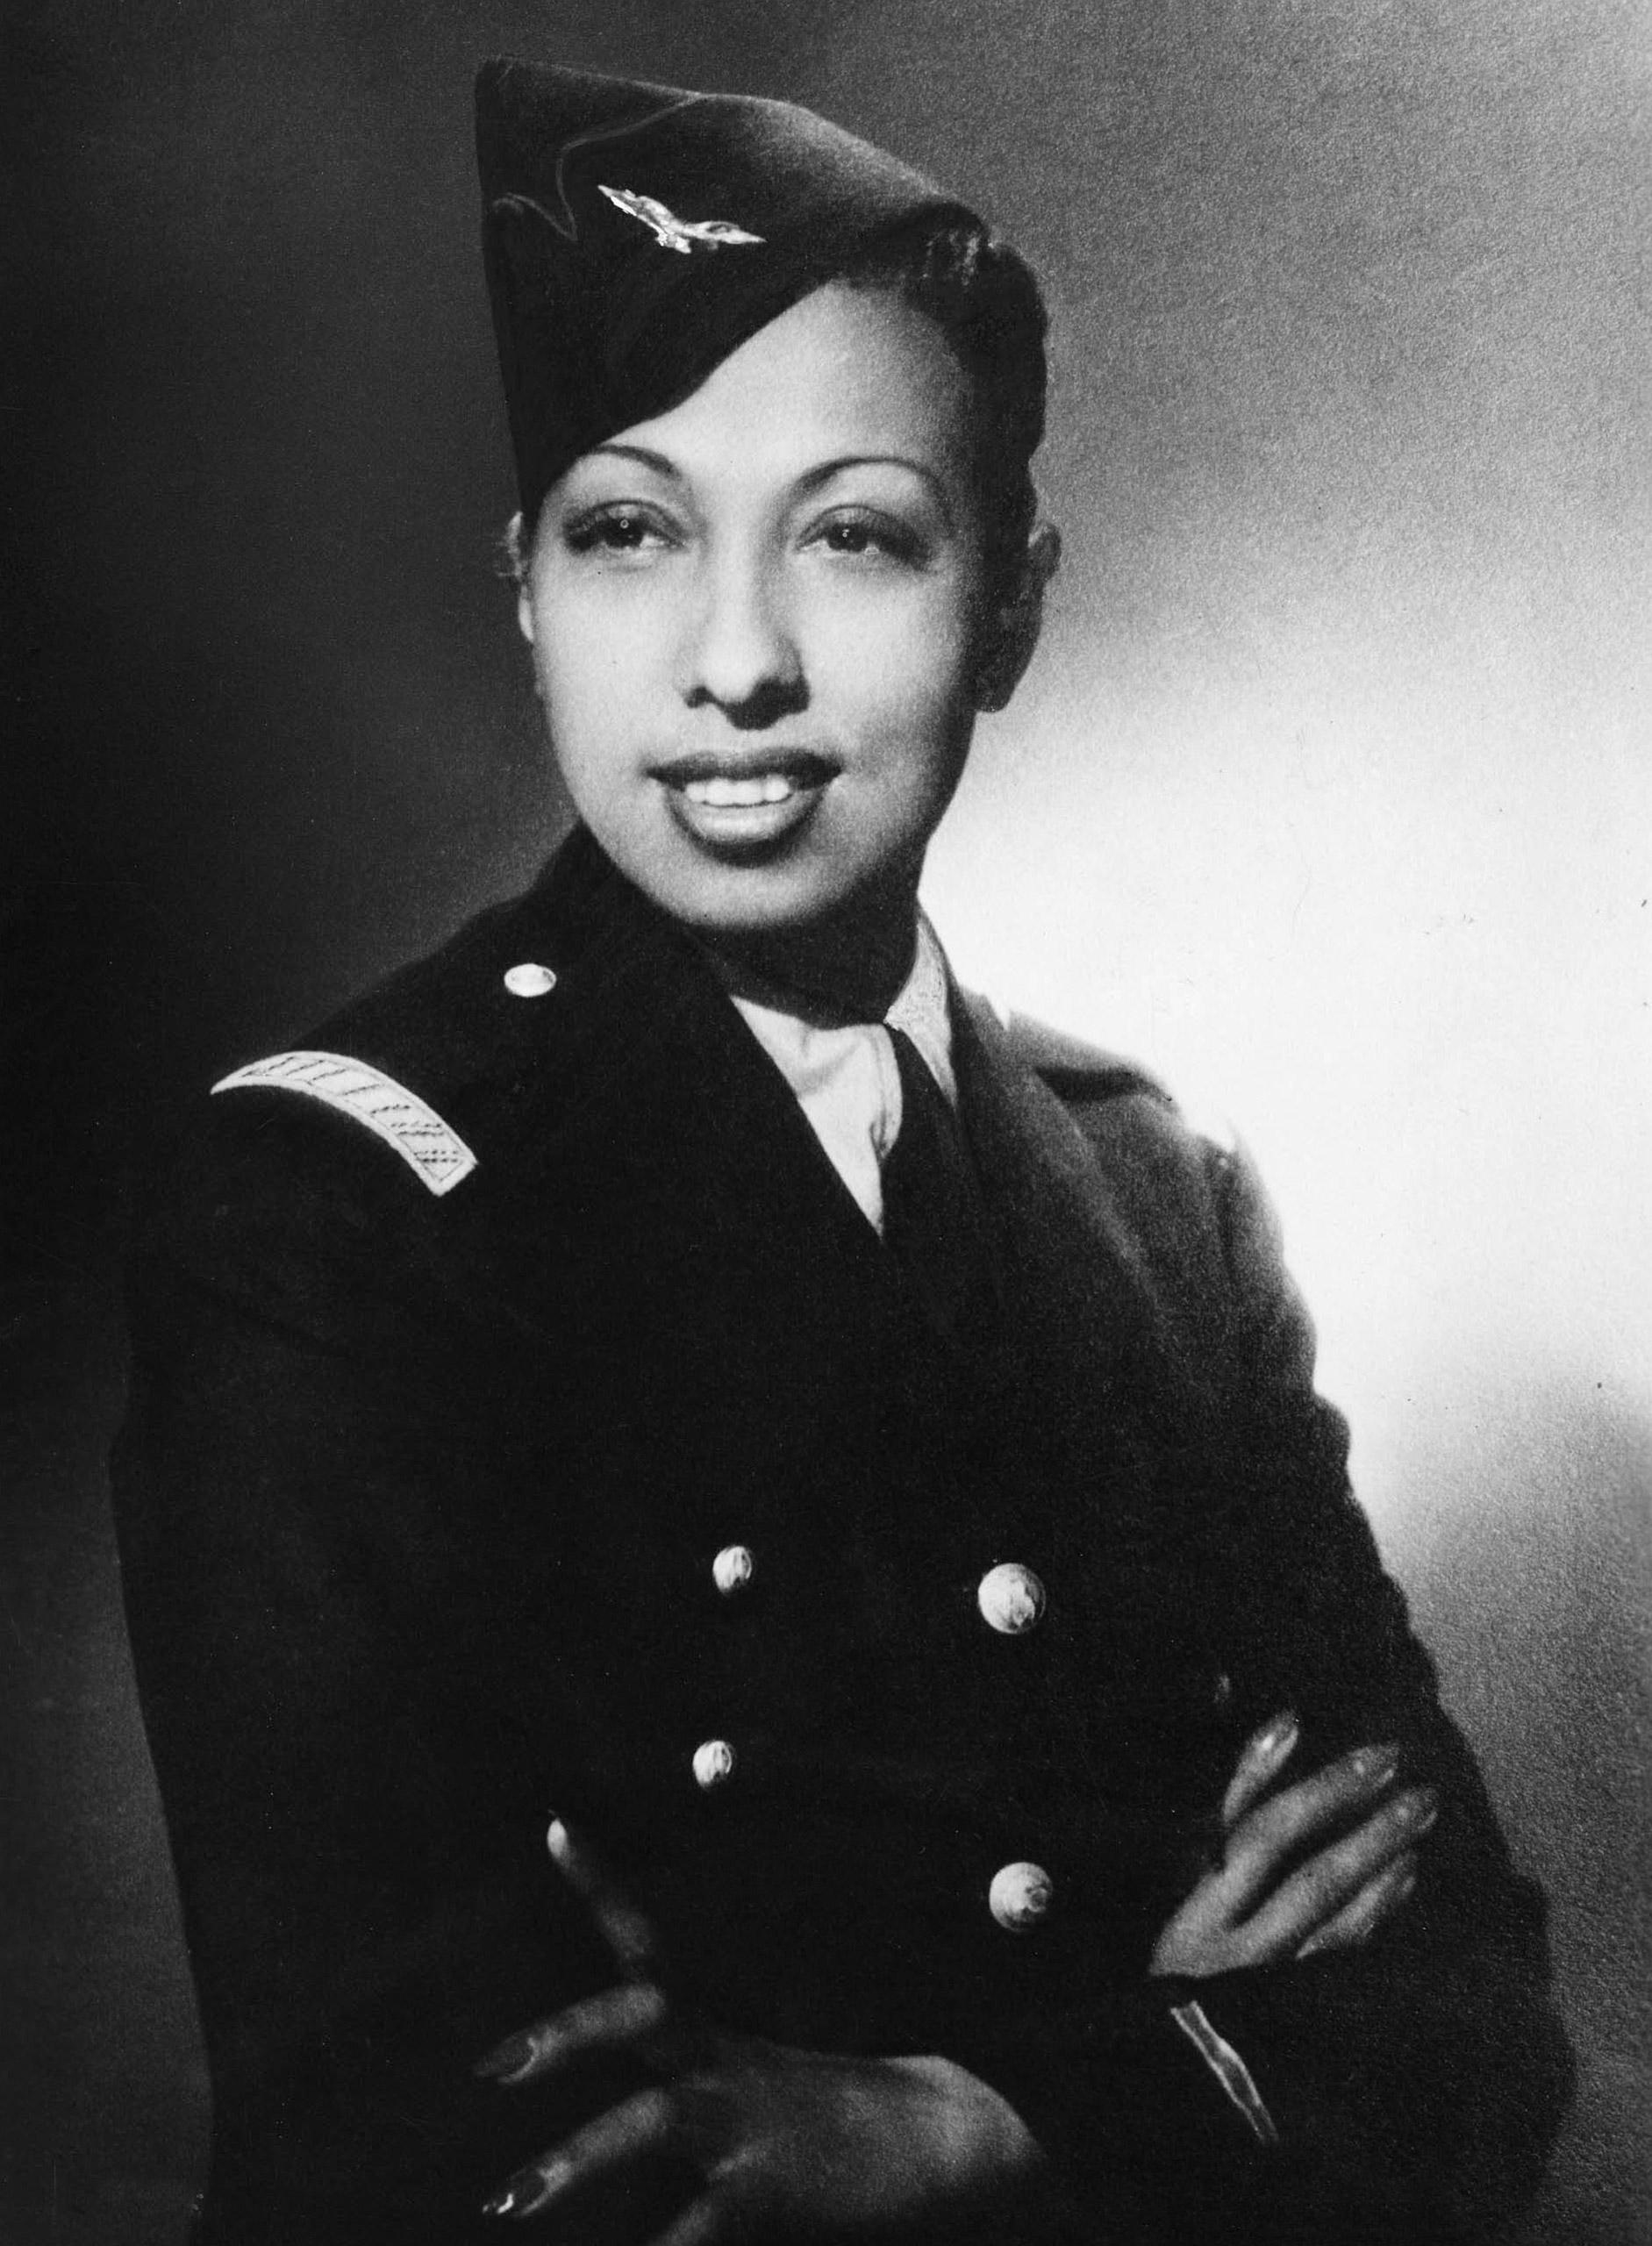 Josephine Baker in a military uniform, 1944.